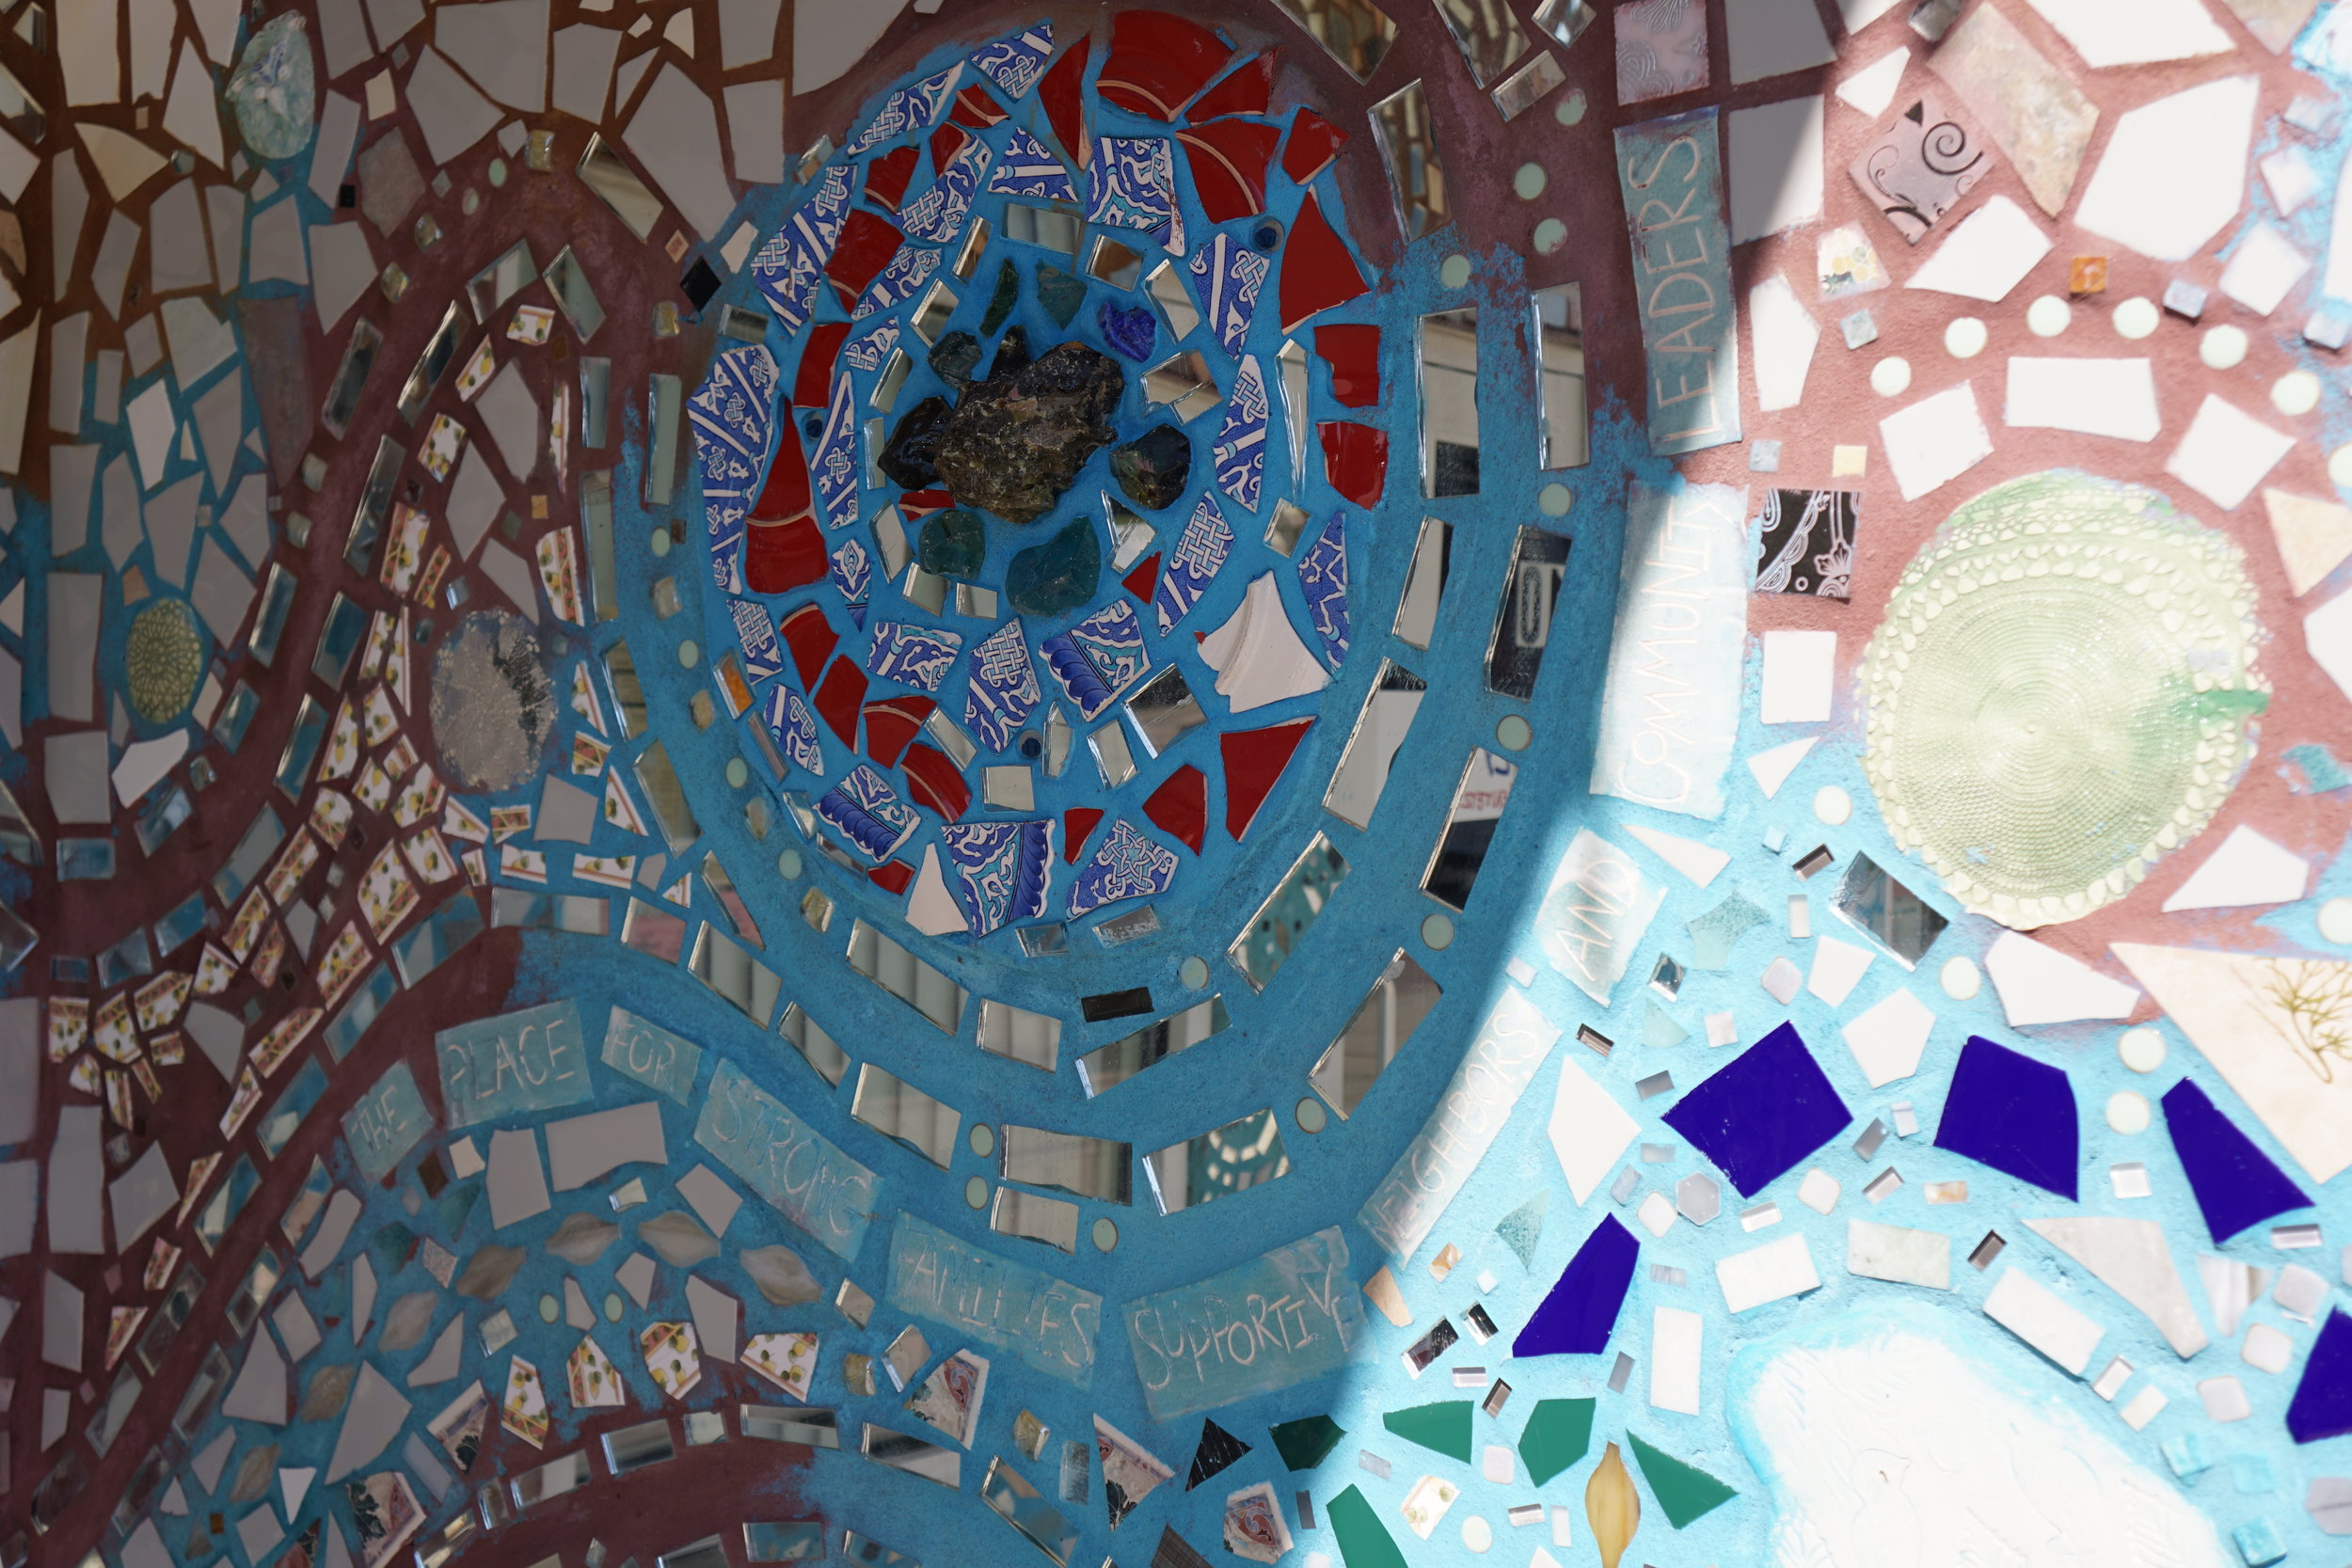 Isaiah Zagar Mosaic Mural for glassboro24.jpg